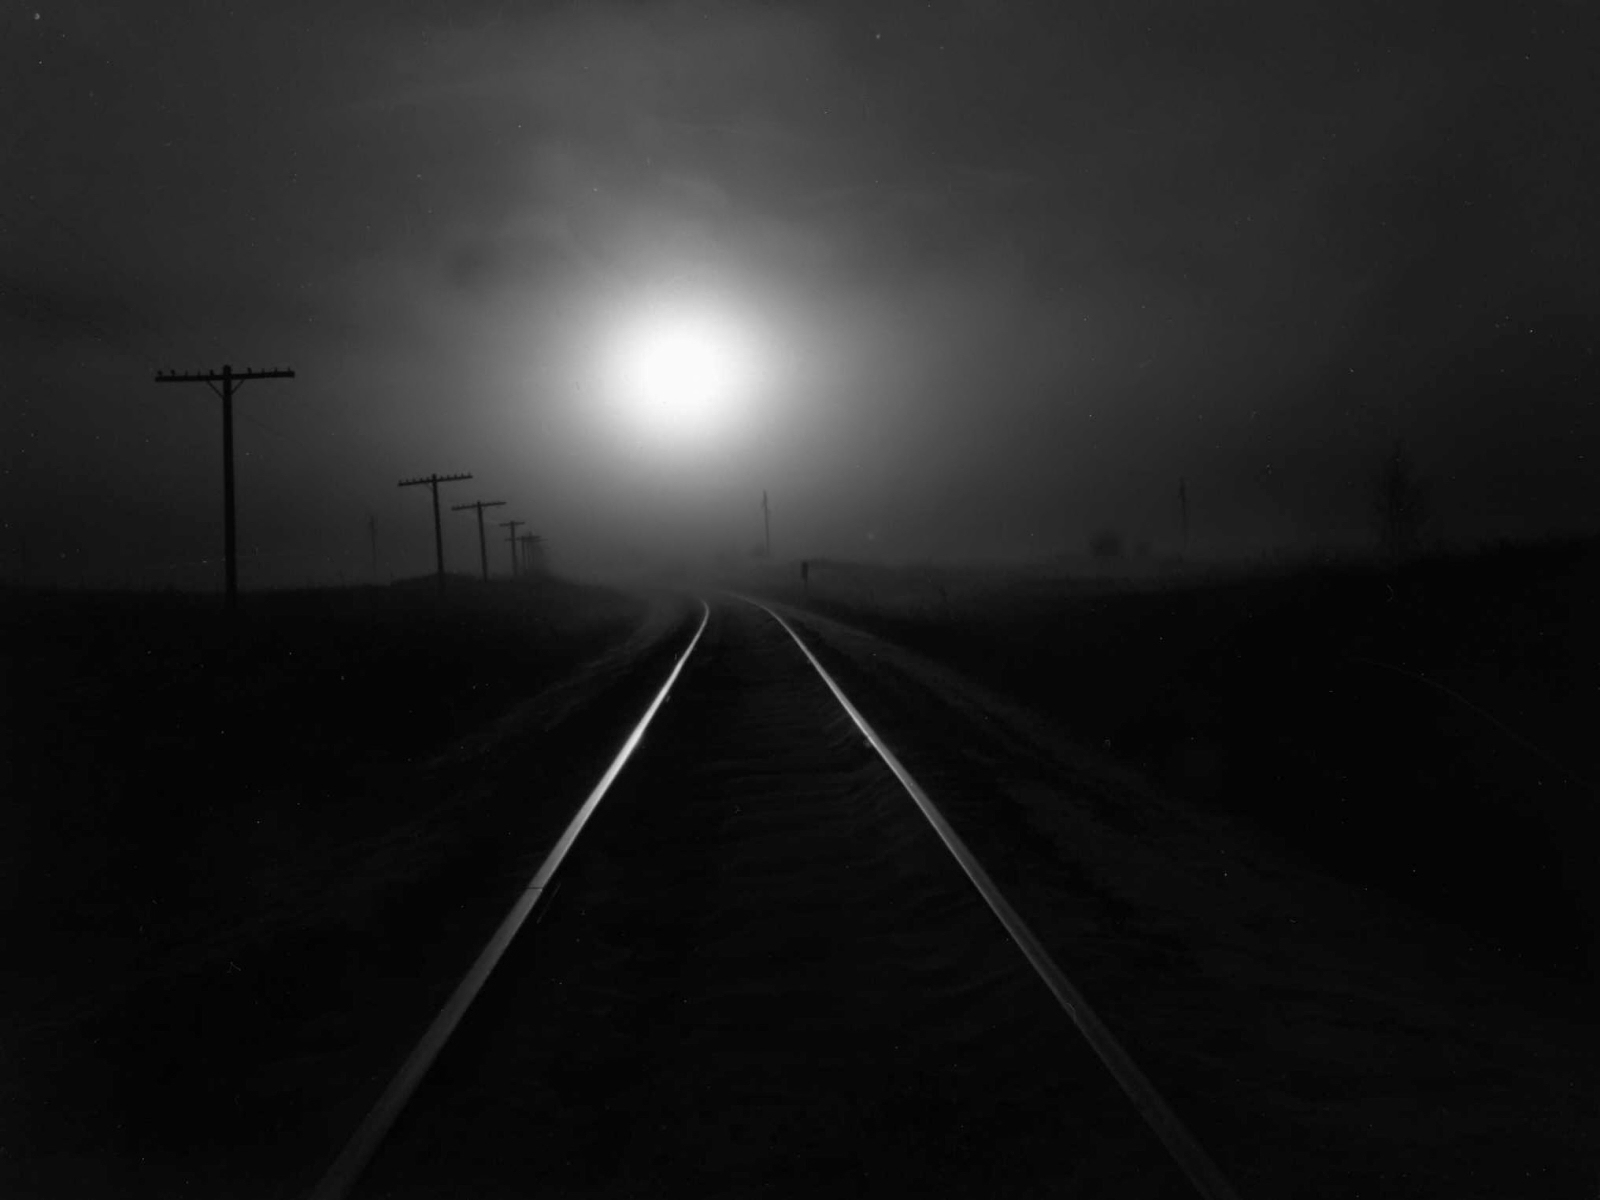 Cool Dark Image